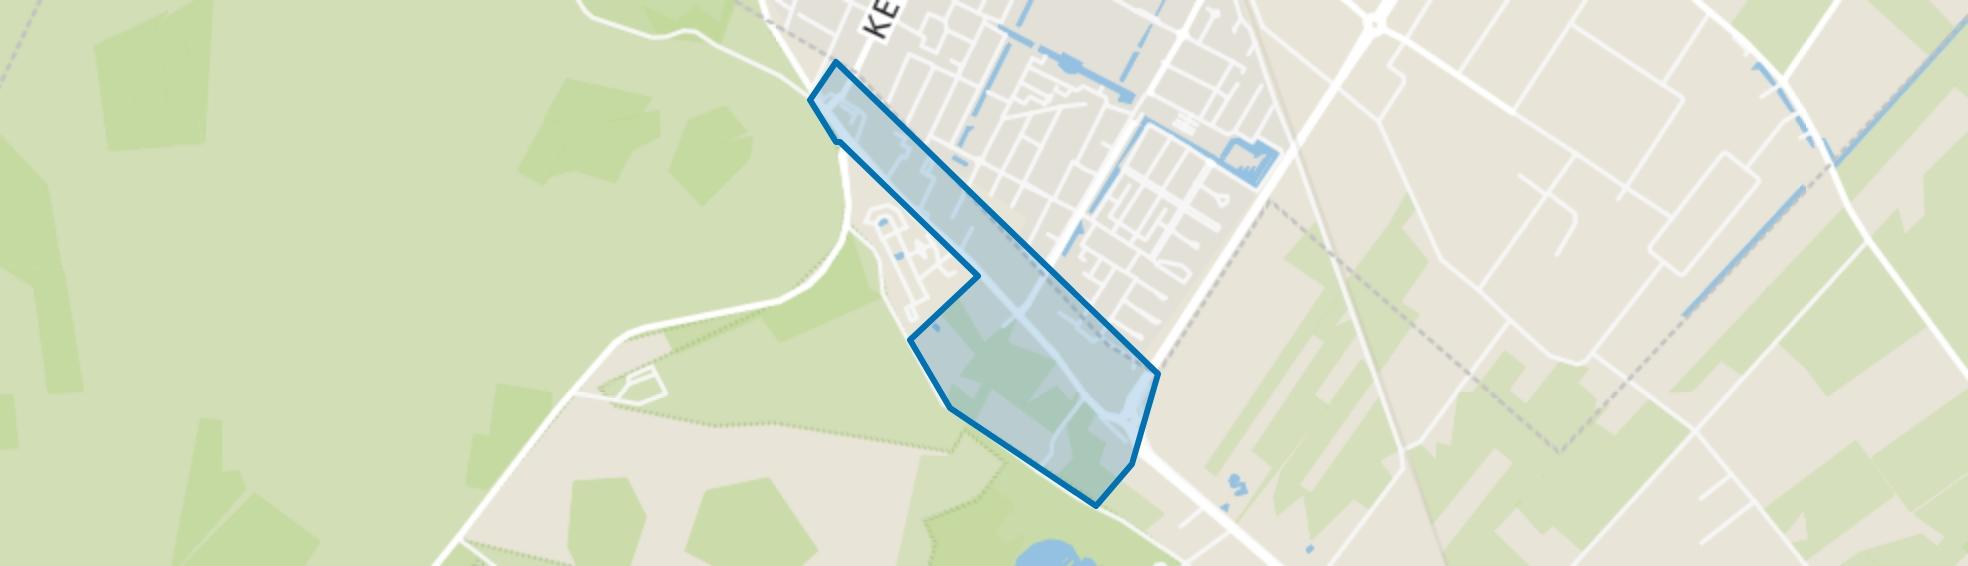 Veeneind, Rhenen map